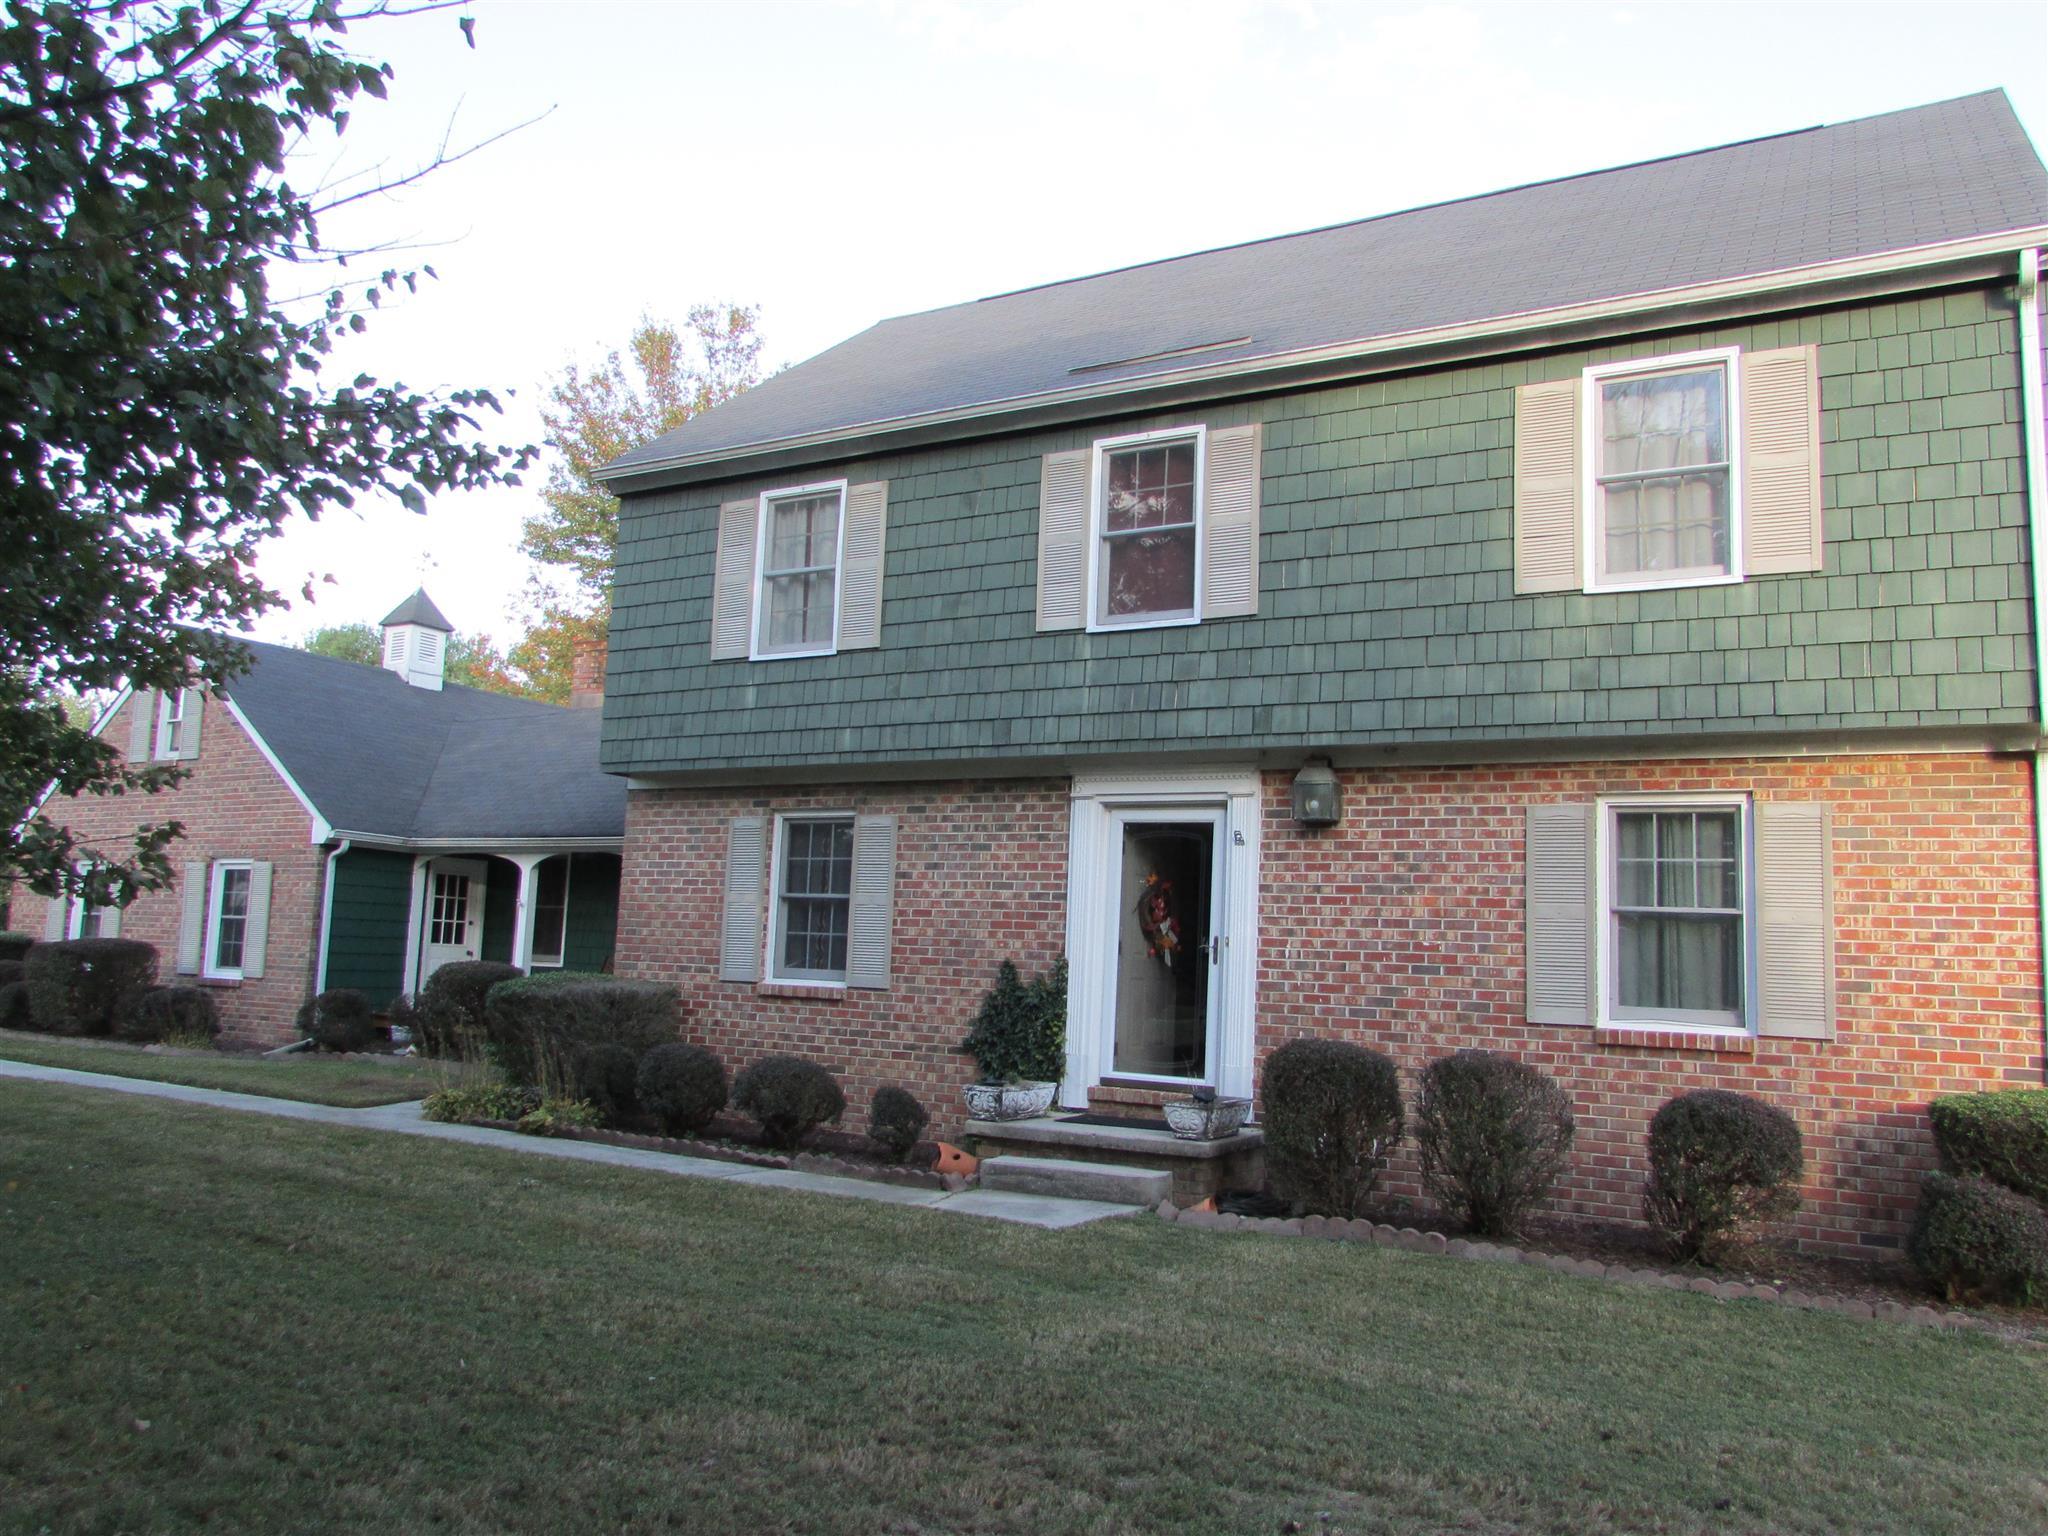 1204 Country Club Dr, Tullahoma, TN 37388 - Tullahoma, TN real estate listing